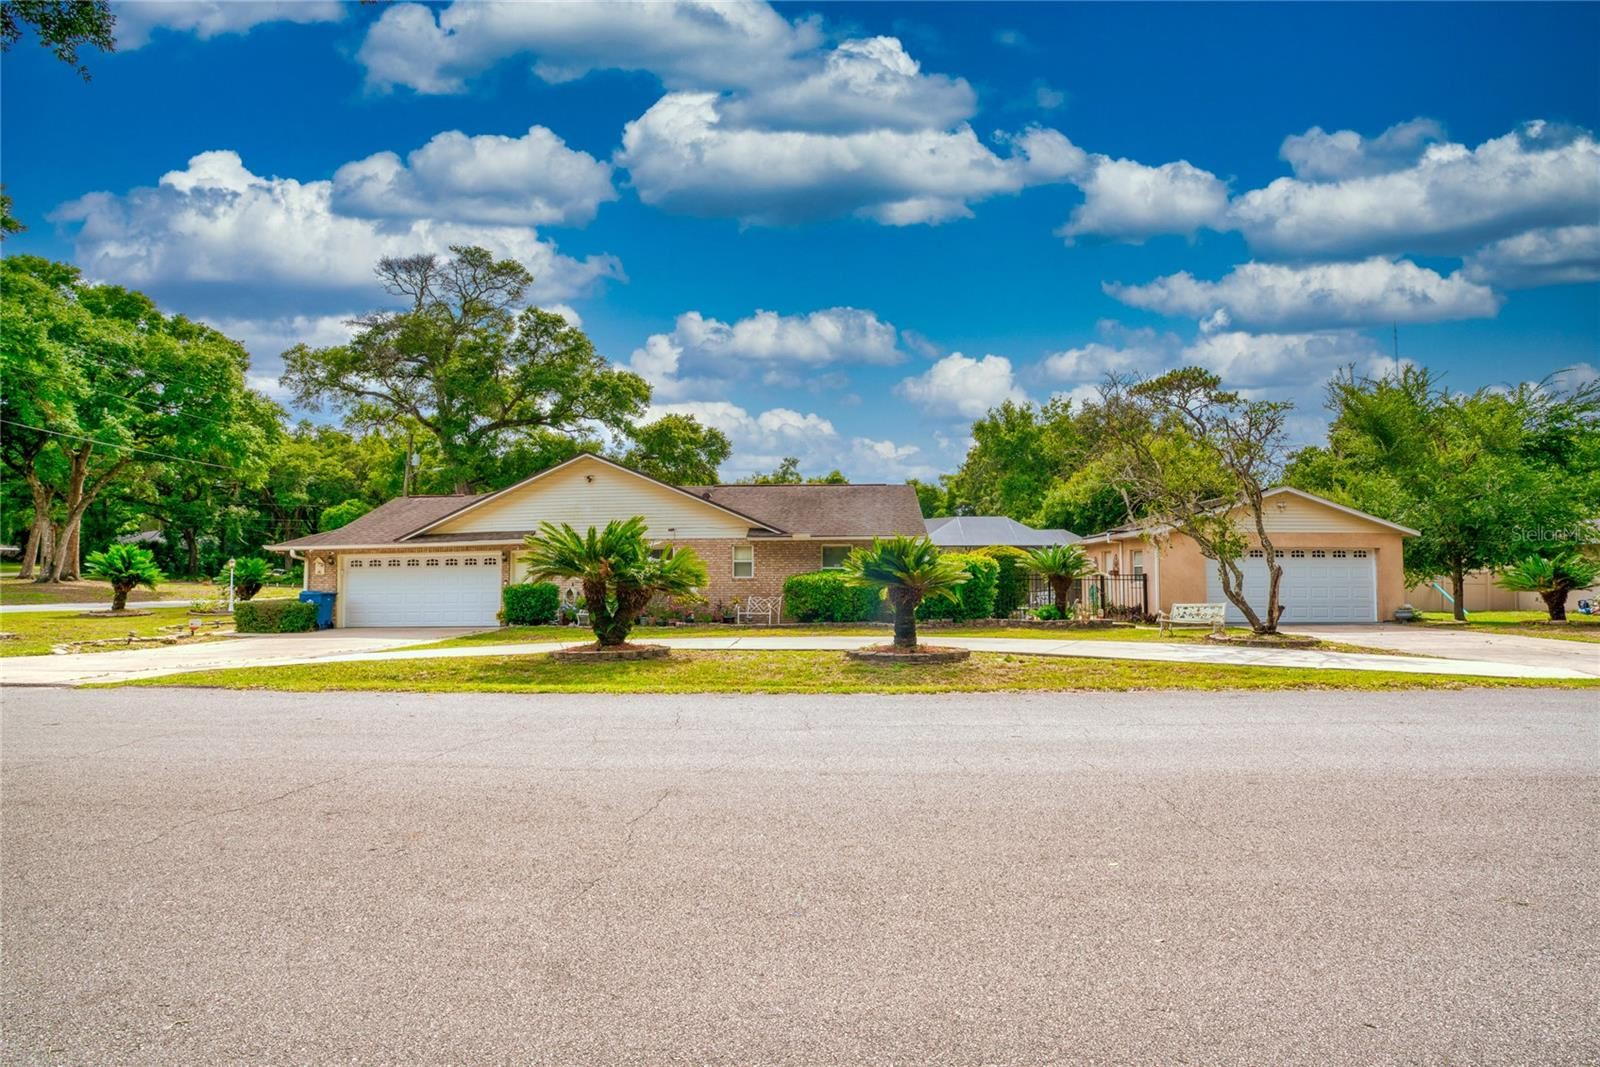 137 W GARDENIA DRIVE, Orange City, FL 32763 - #: V4919507